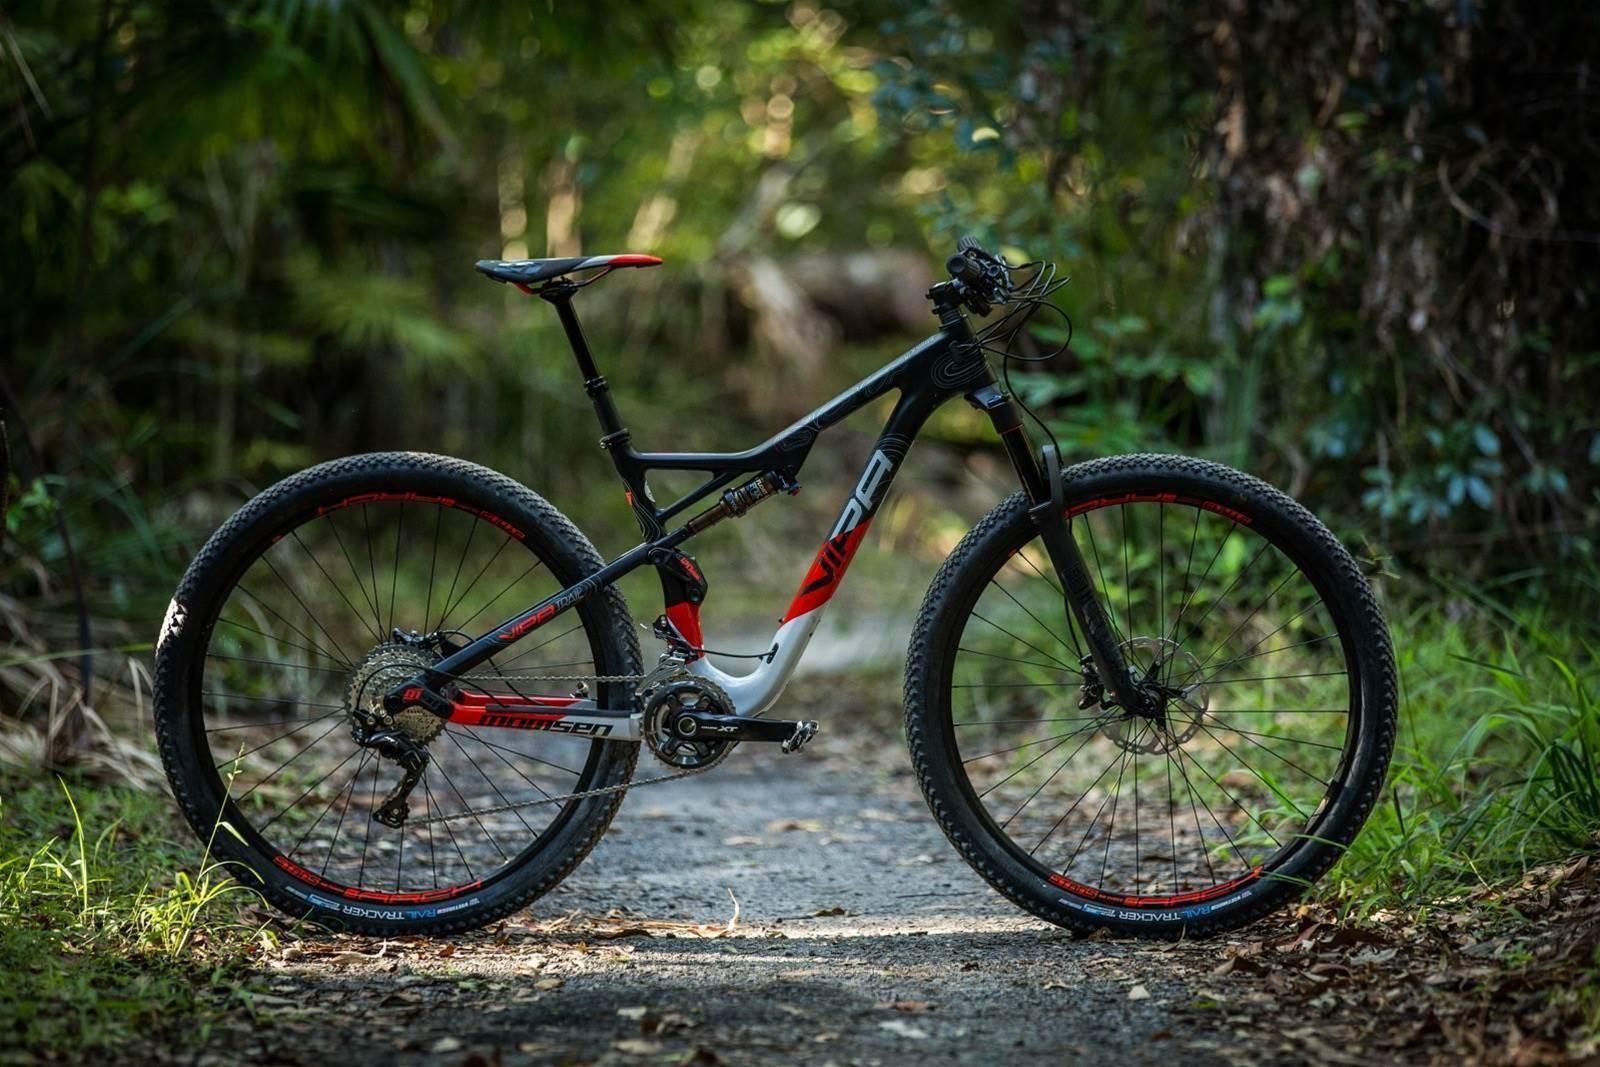 TESTED: Momsen Vipa Trail